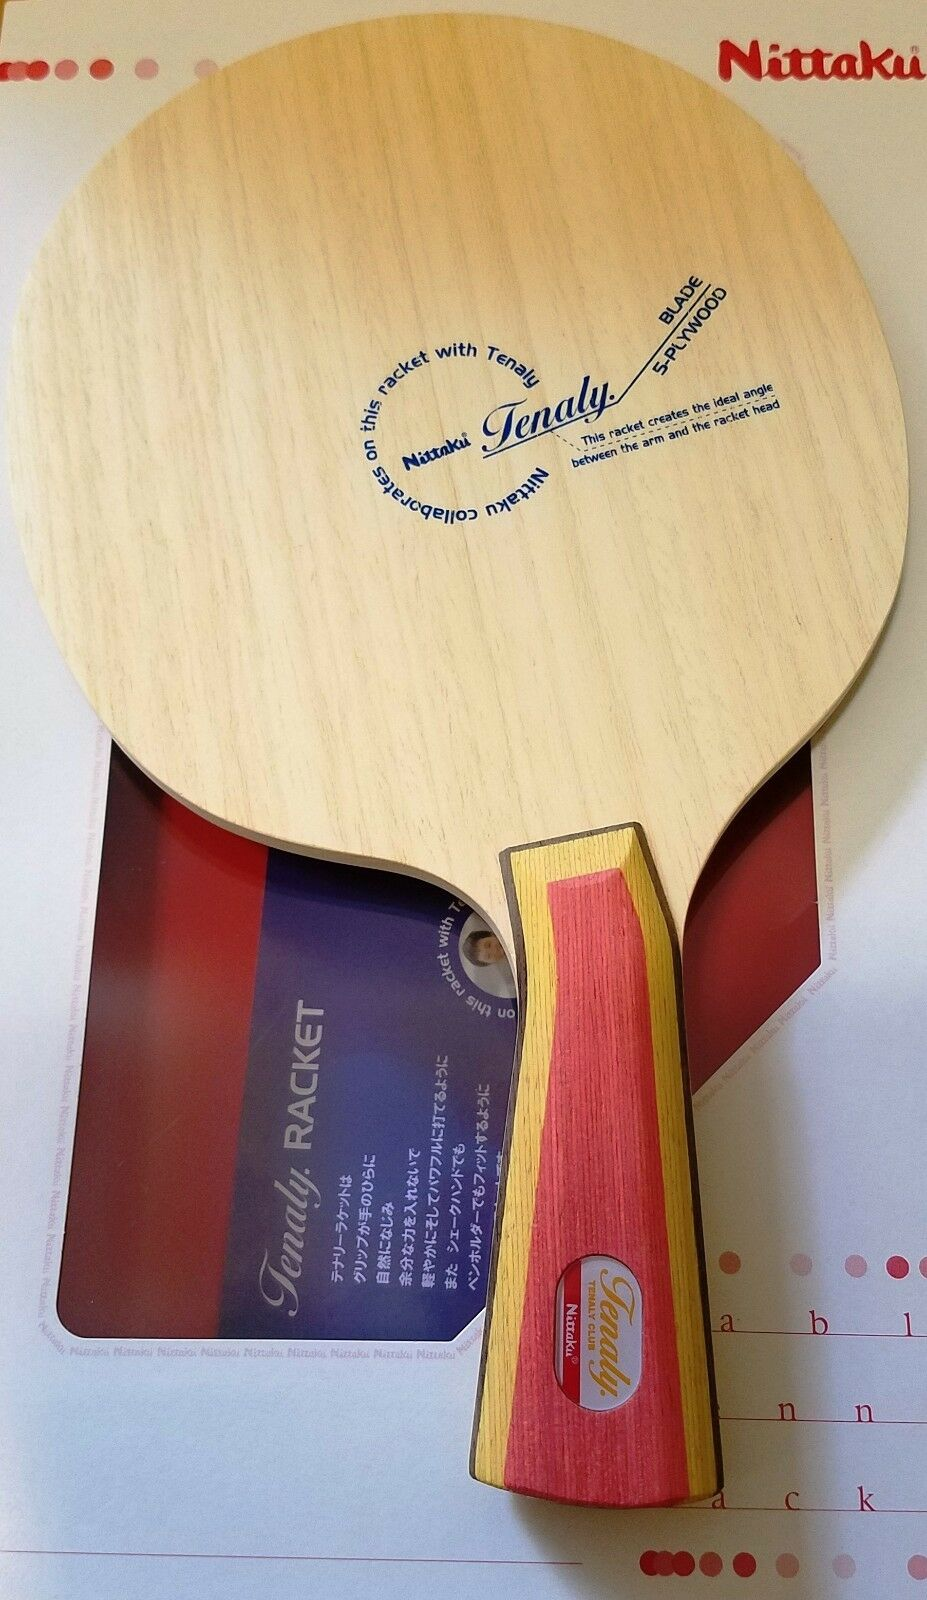 Nittaku Tenaly Original Unique  Bent Handle Handle Handle 81 Grams Table Tennis Blade 7d54cd